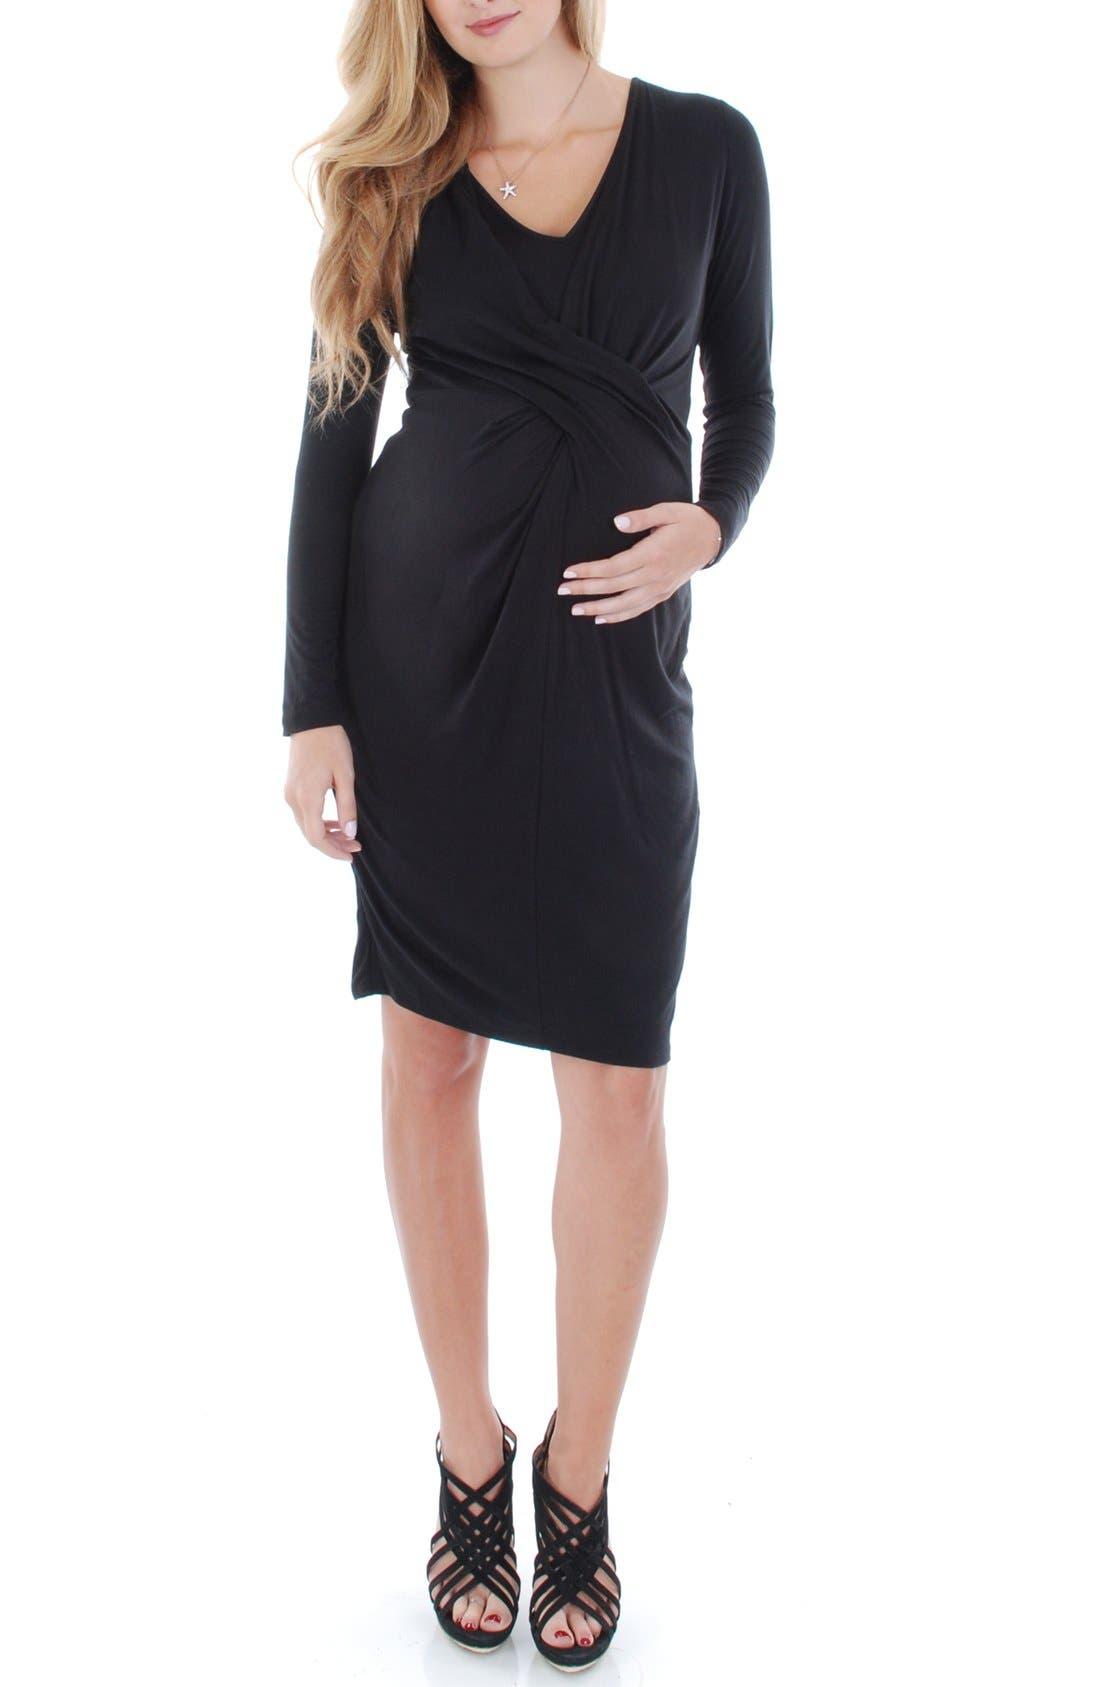 Everly Grey 'Sloan' Maternity/Nursing Dress